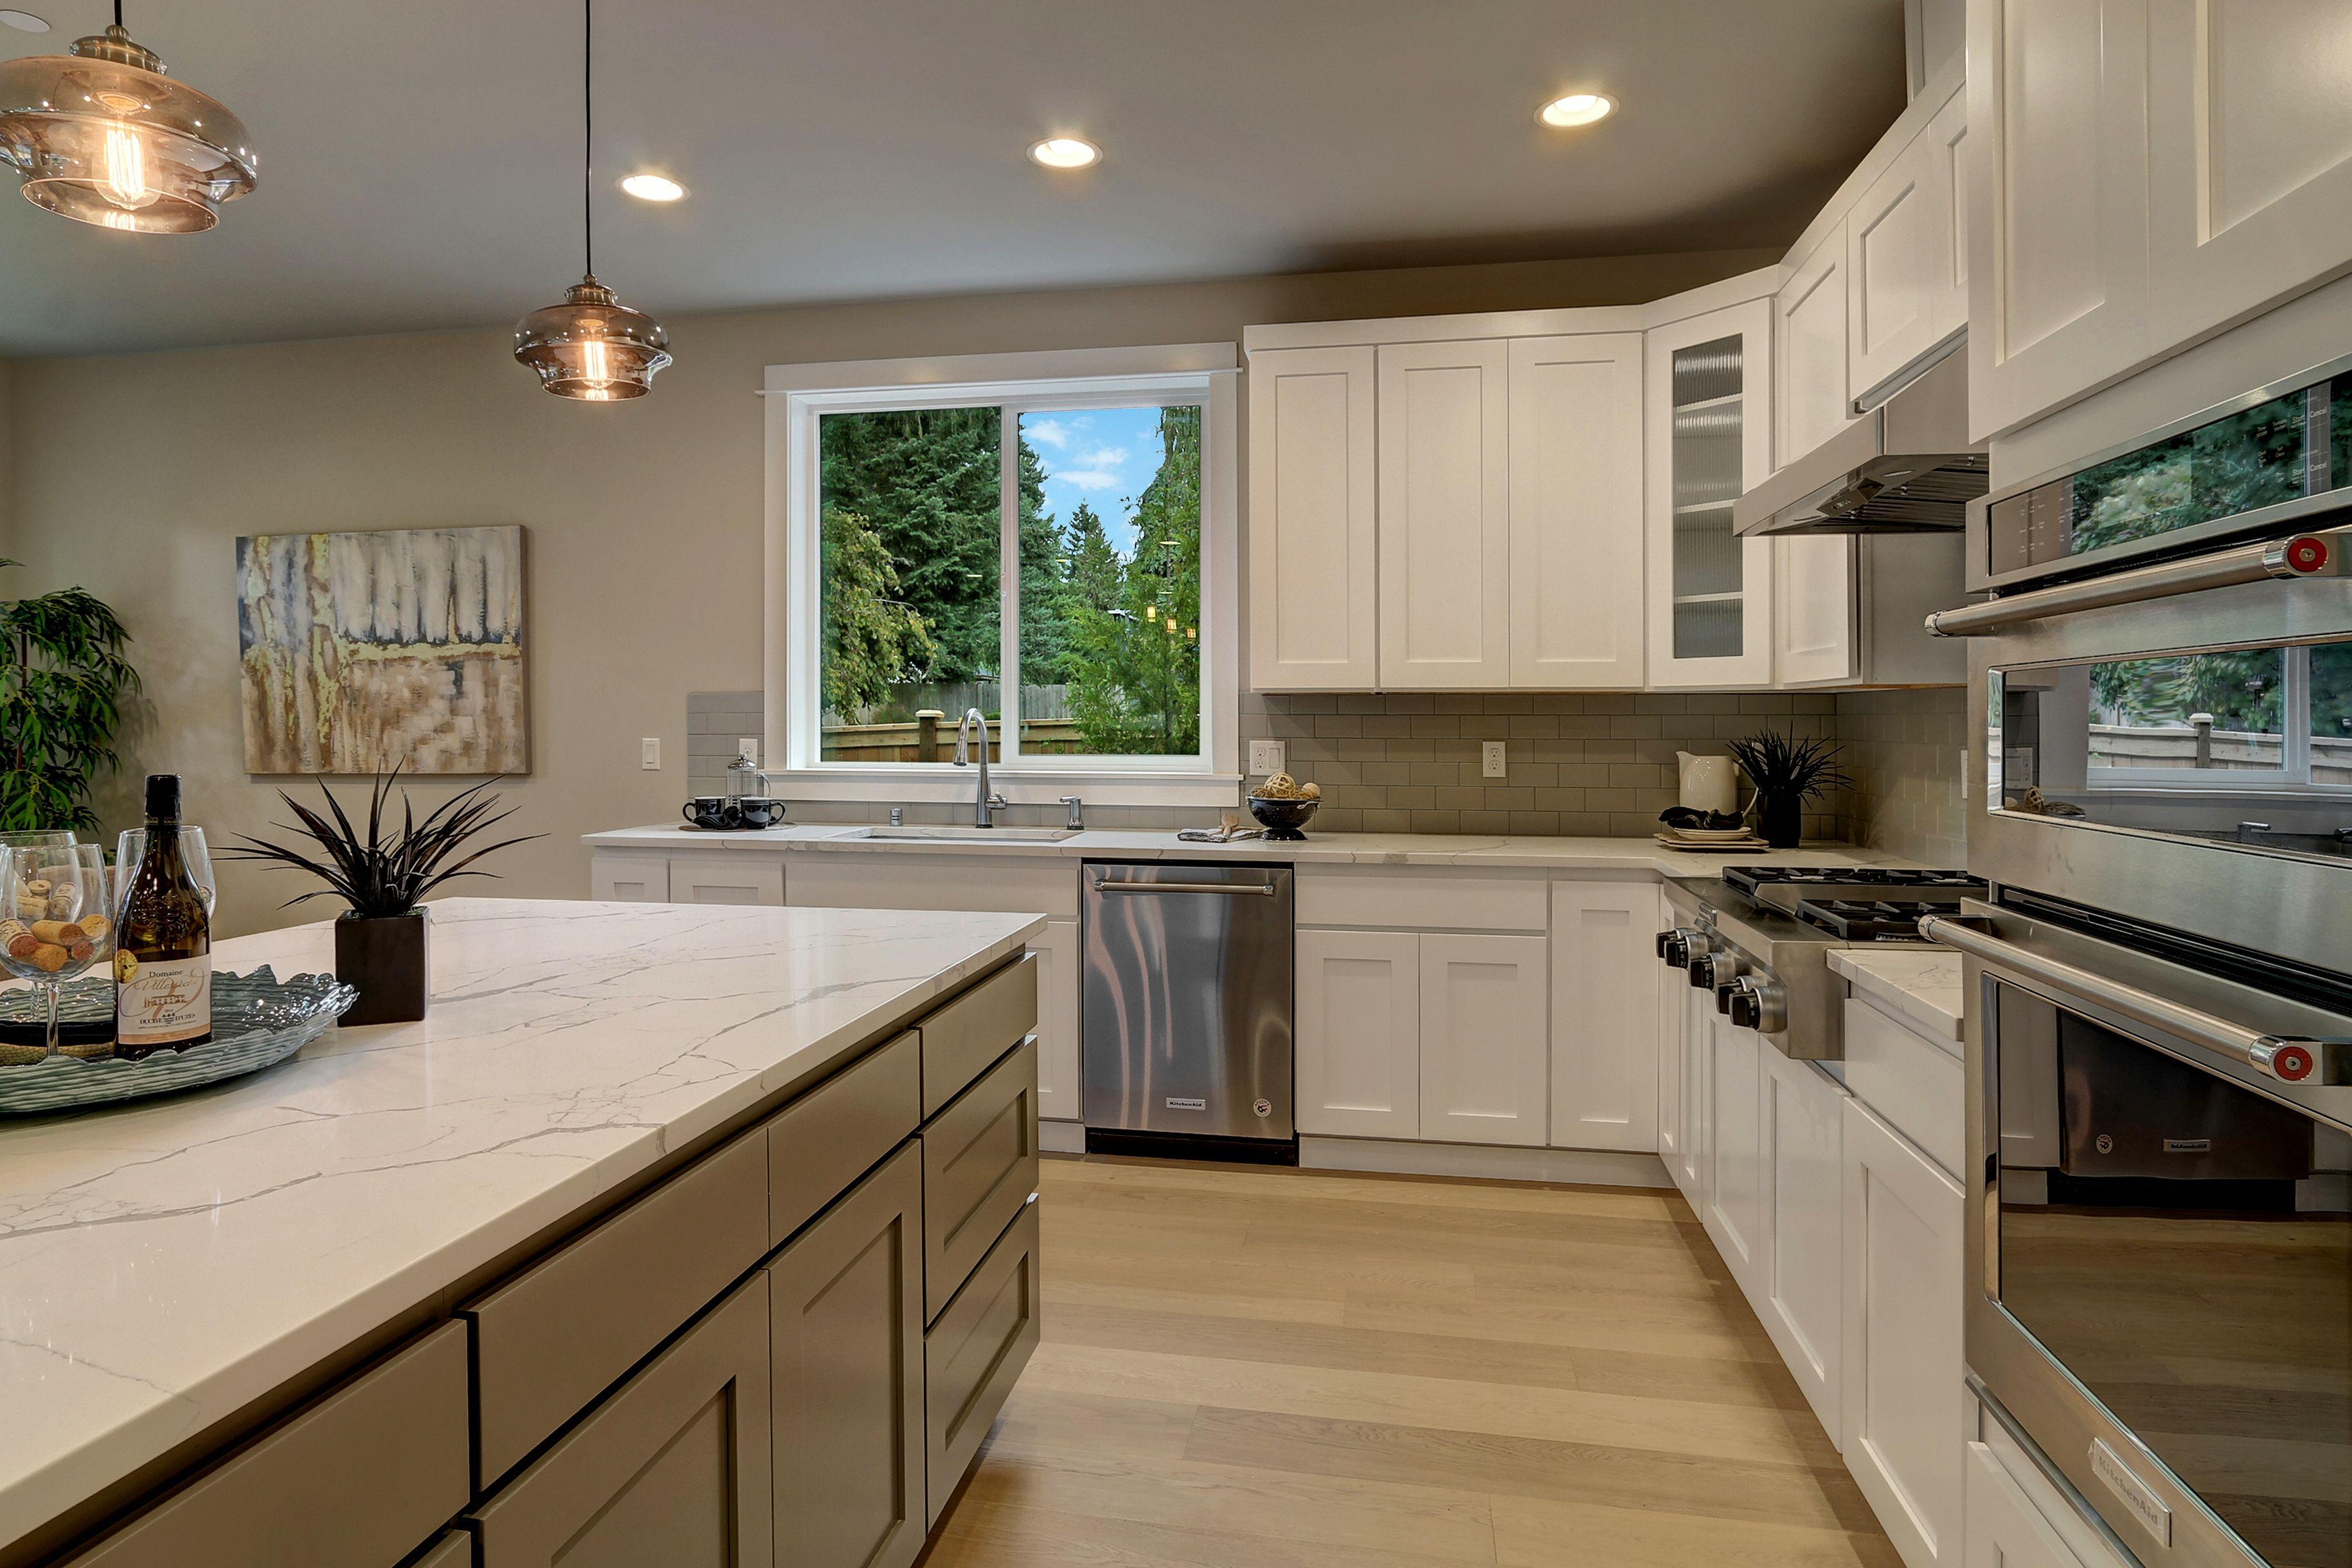 Best Amazing Gourmet Kitchen With Calacatta Laza Quartz And 640 x 480